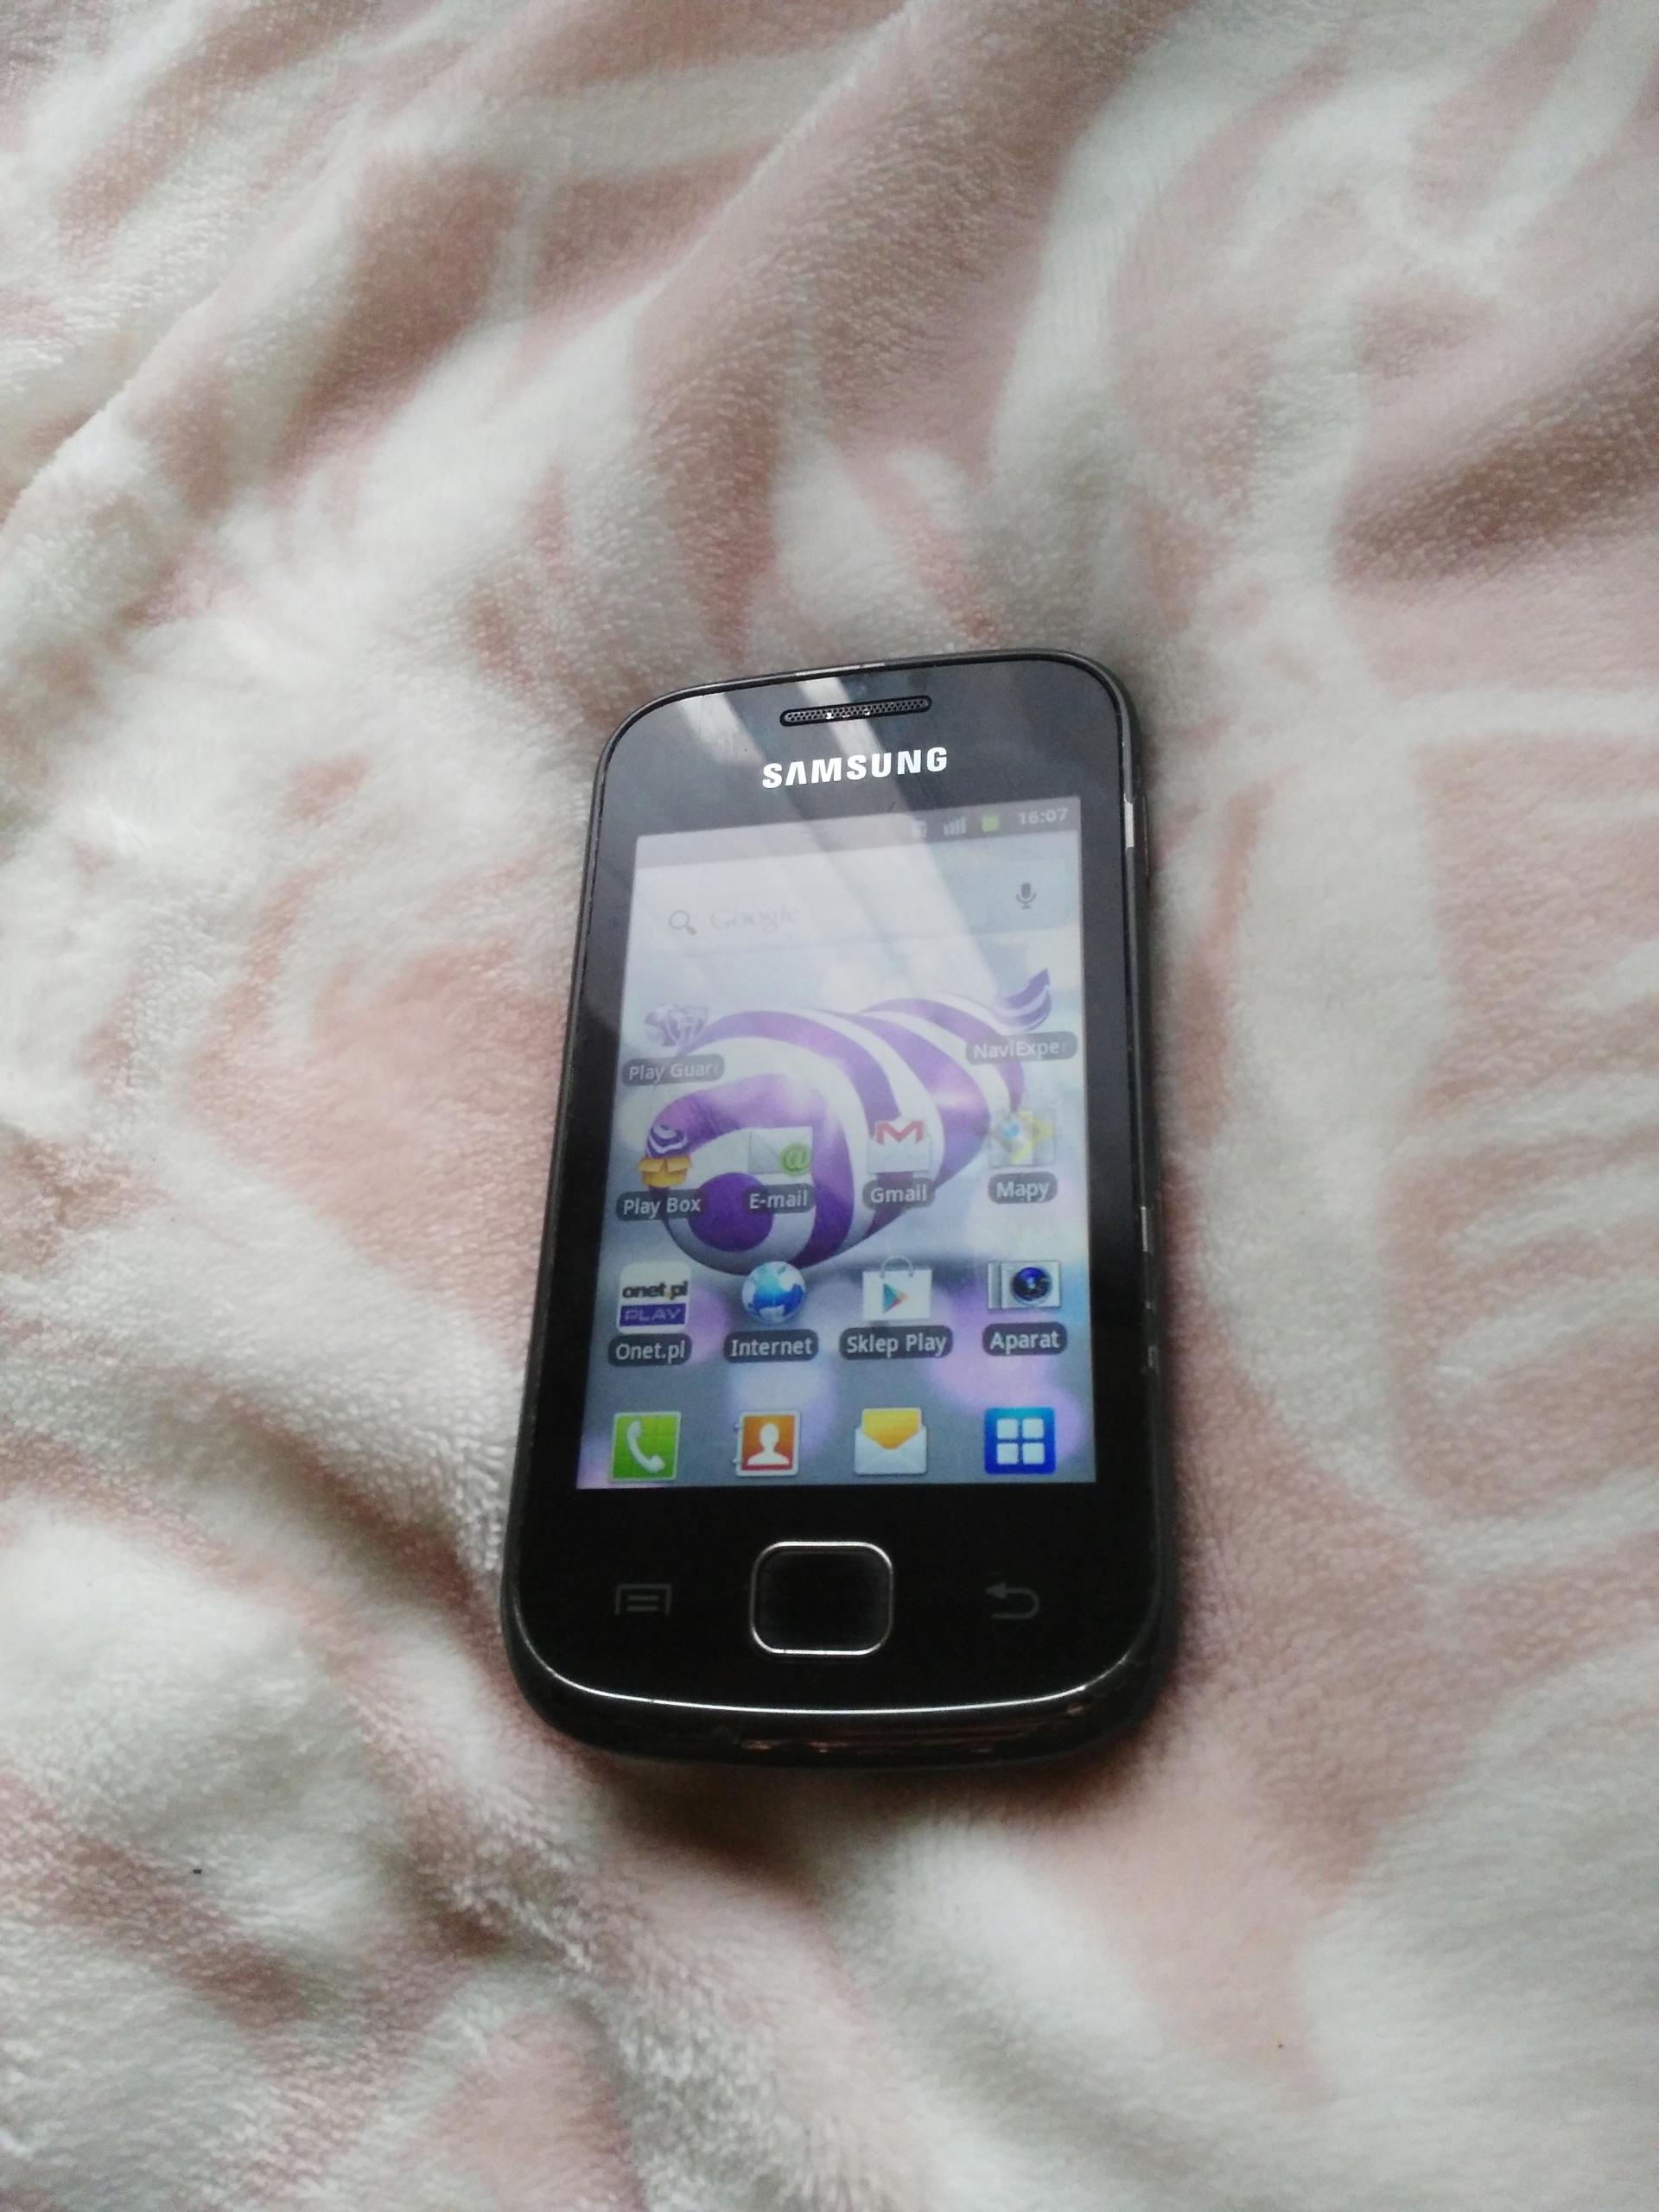 Samsung S5660 Gio